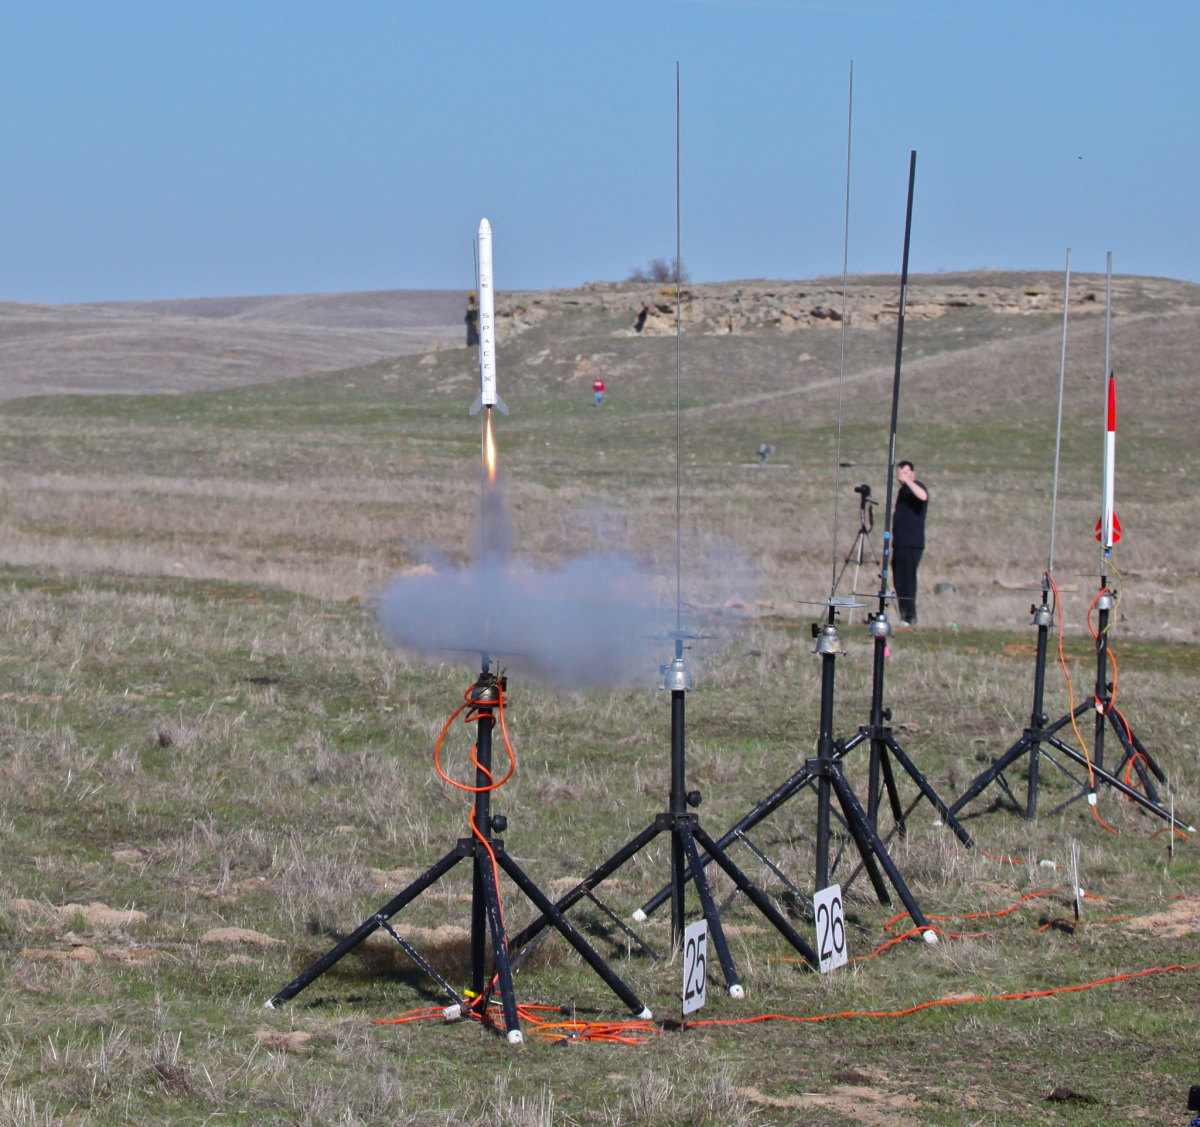 model-rockets-are-fun